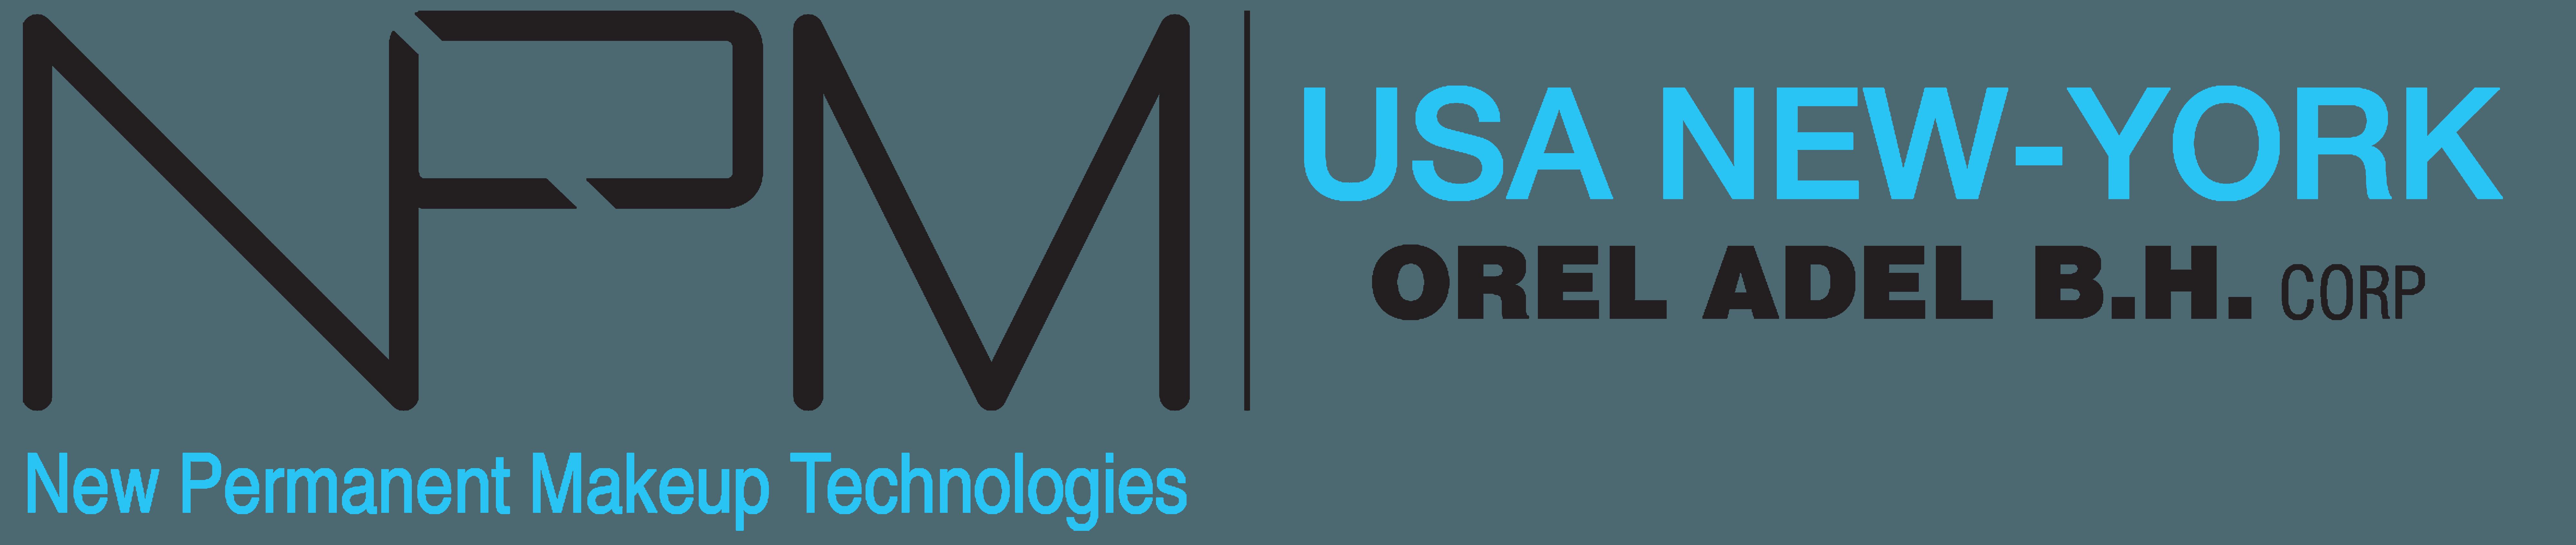 NPM_USANEWYORK_logo